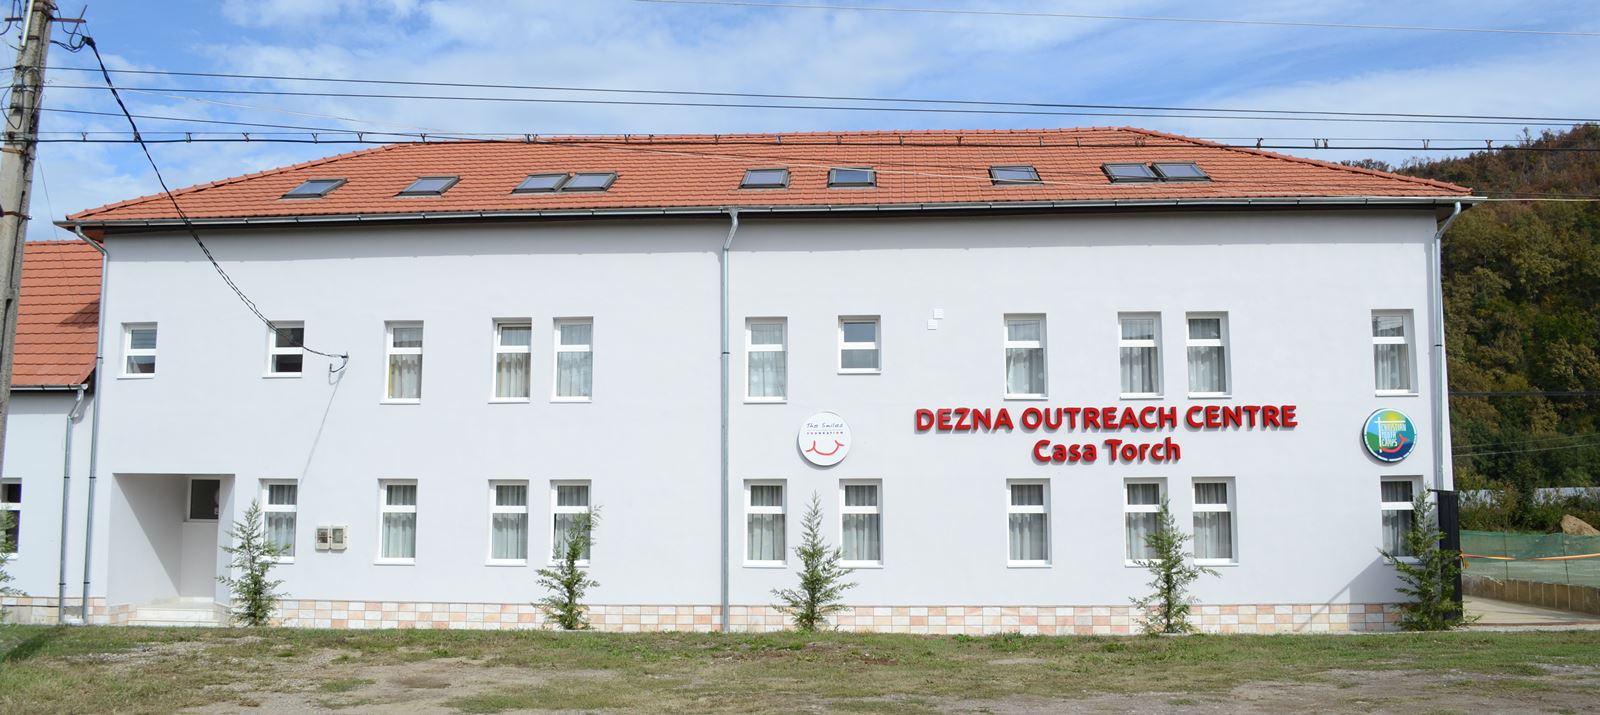 Dezna Outreach Centre, Casa Torch